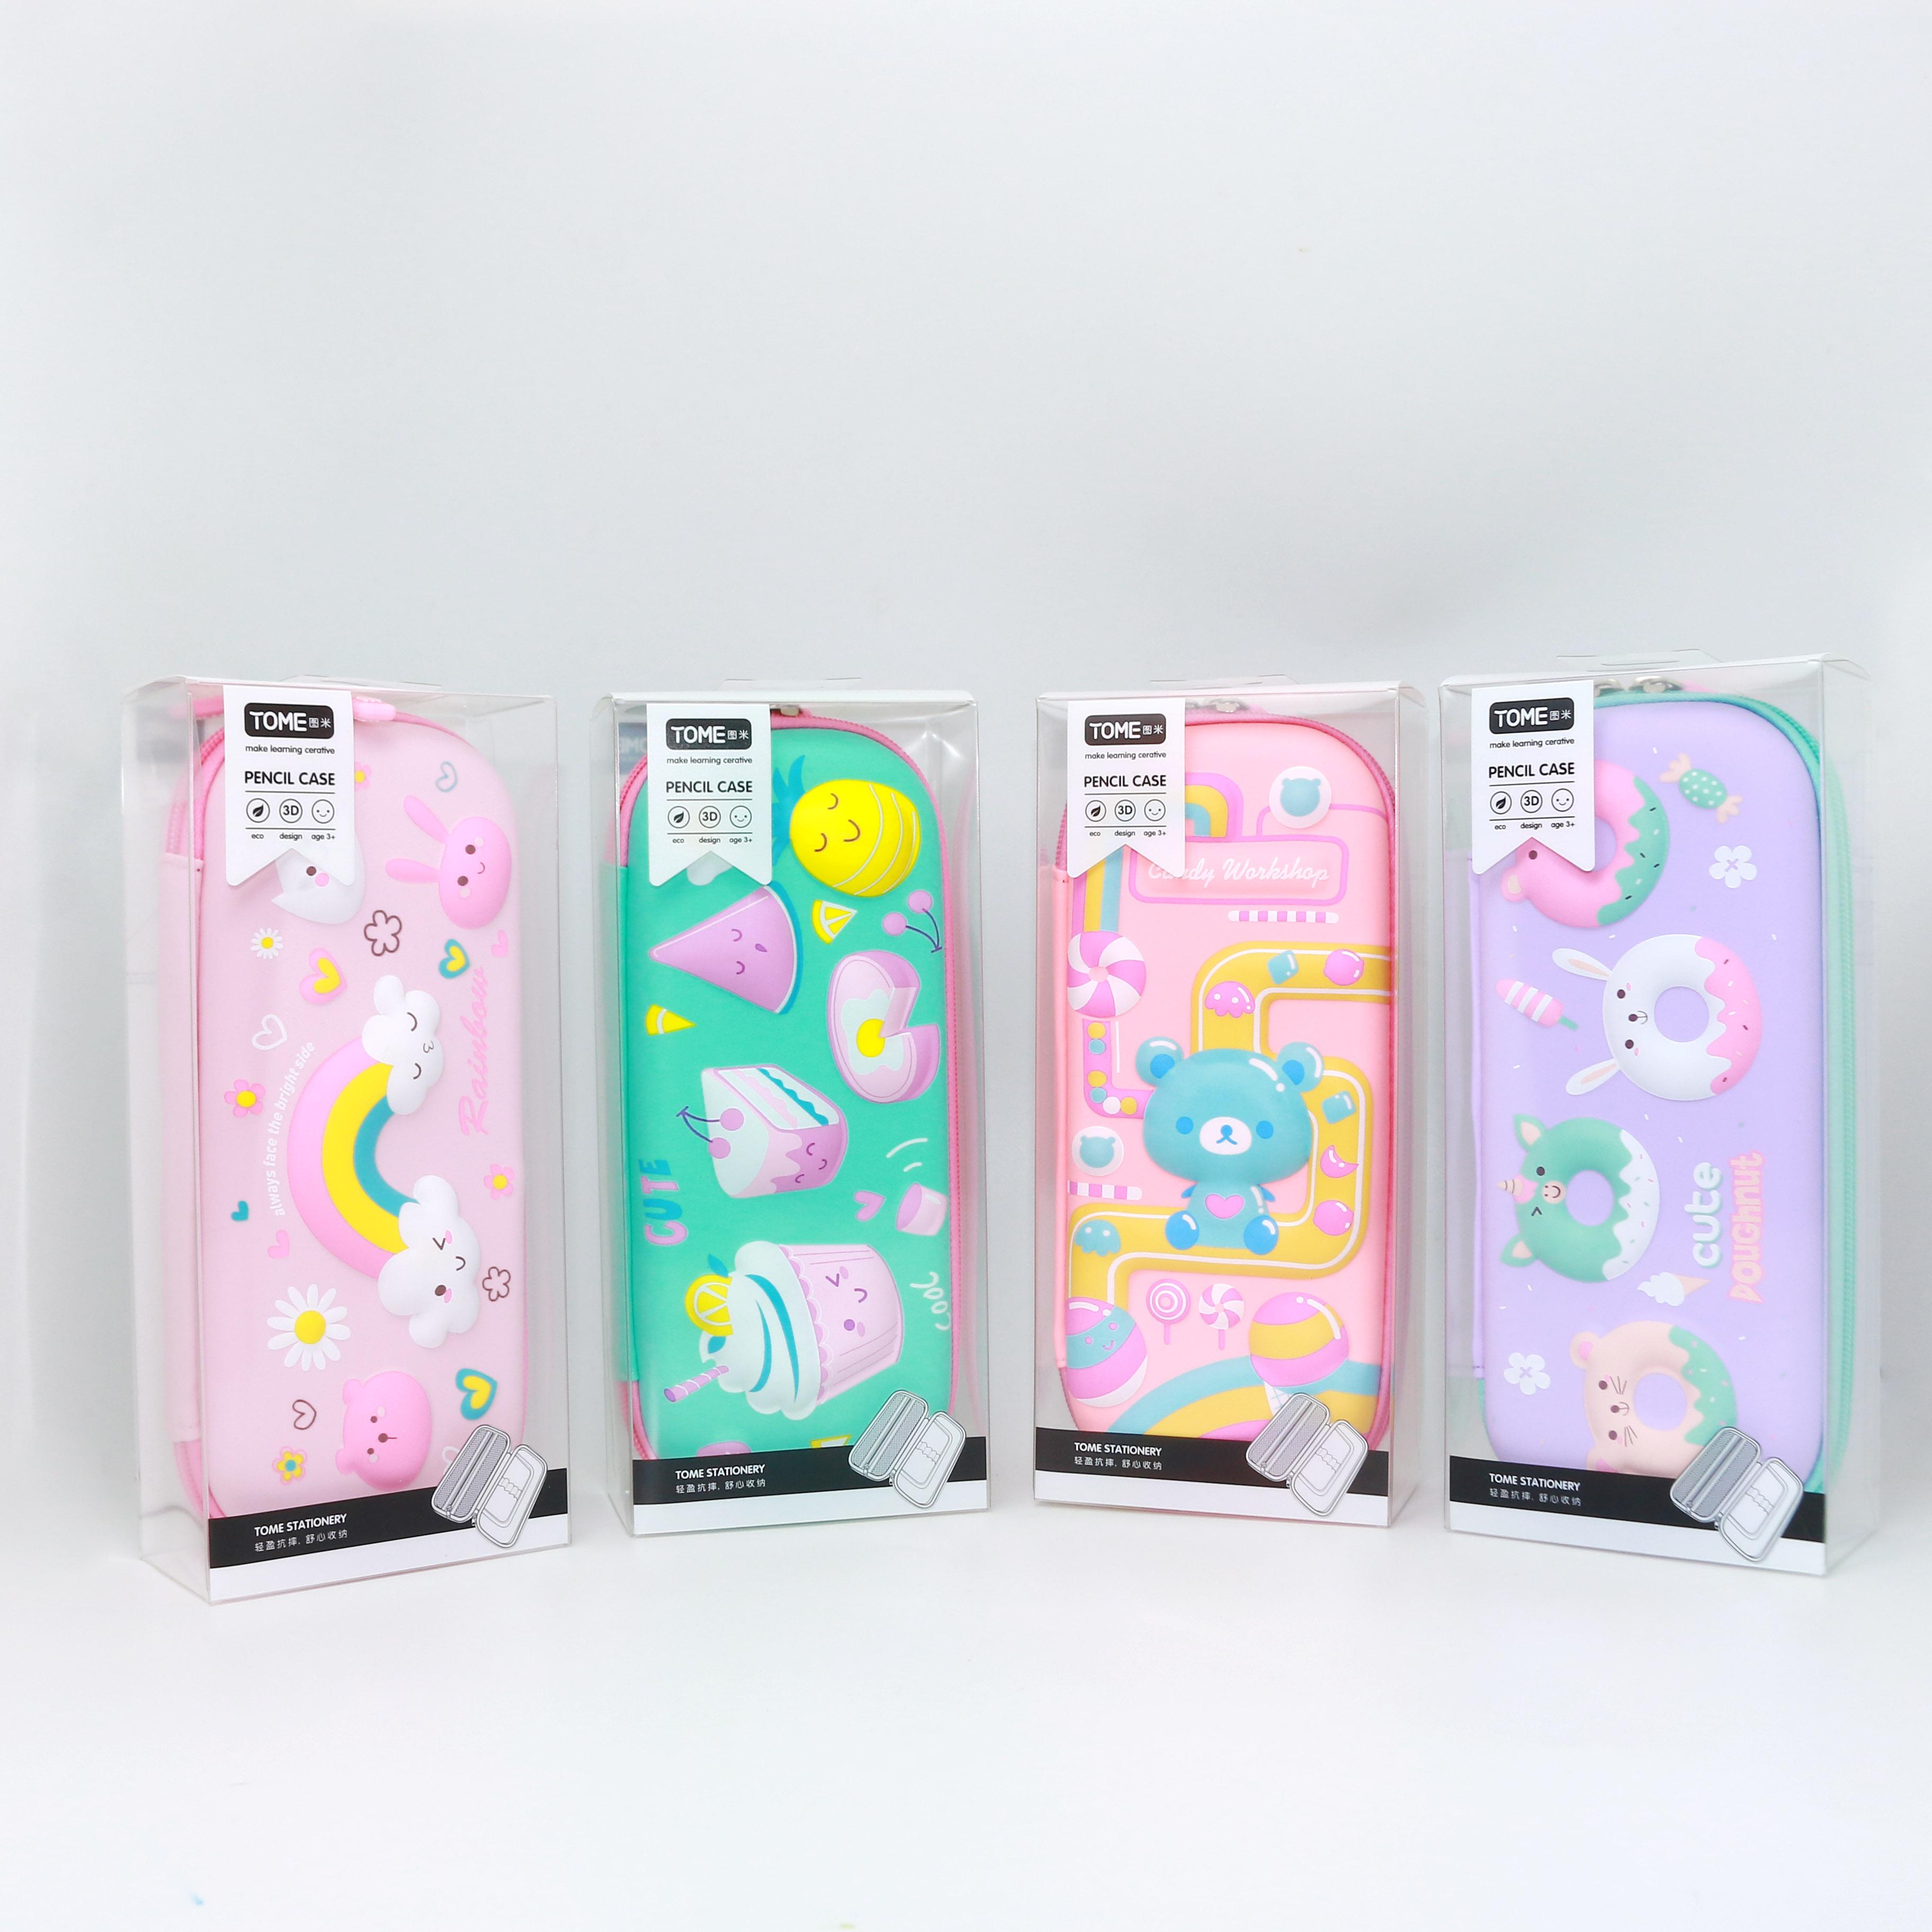 Hộp bút 3D hình cầu vồng, cute Doughnut, kem, gấu TM-G66137